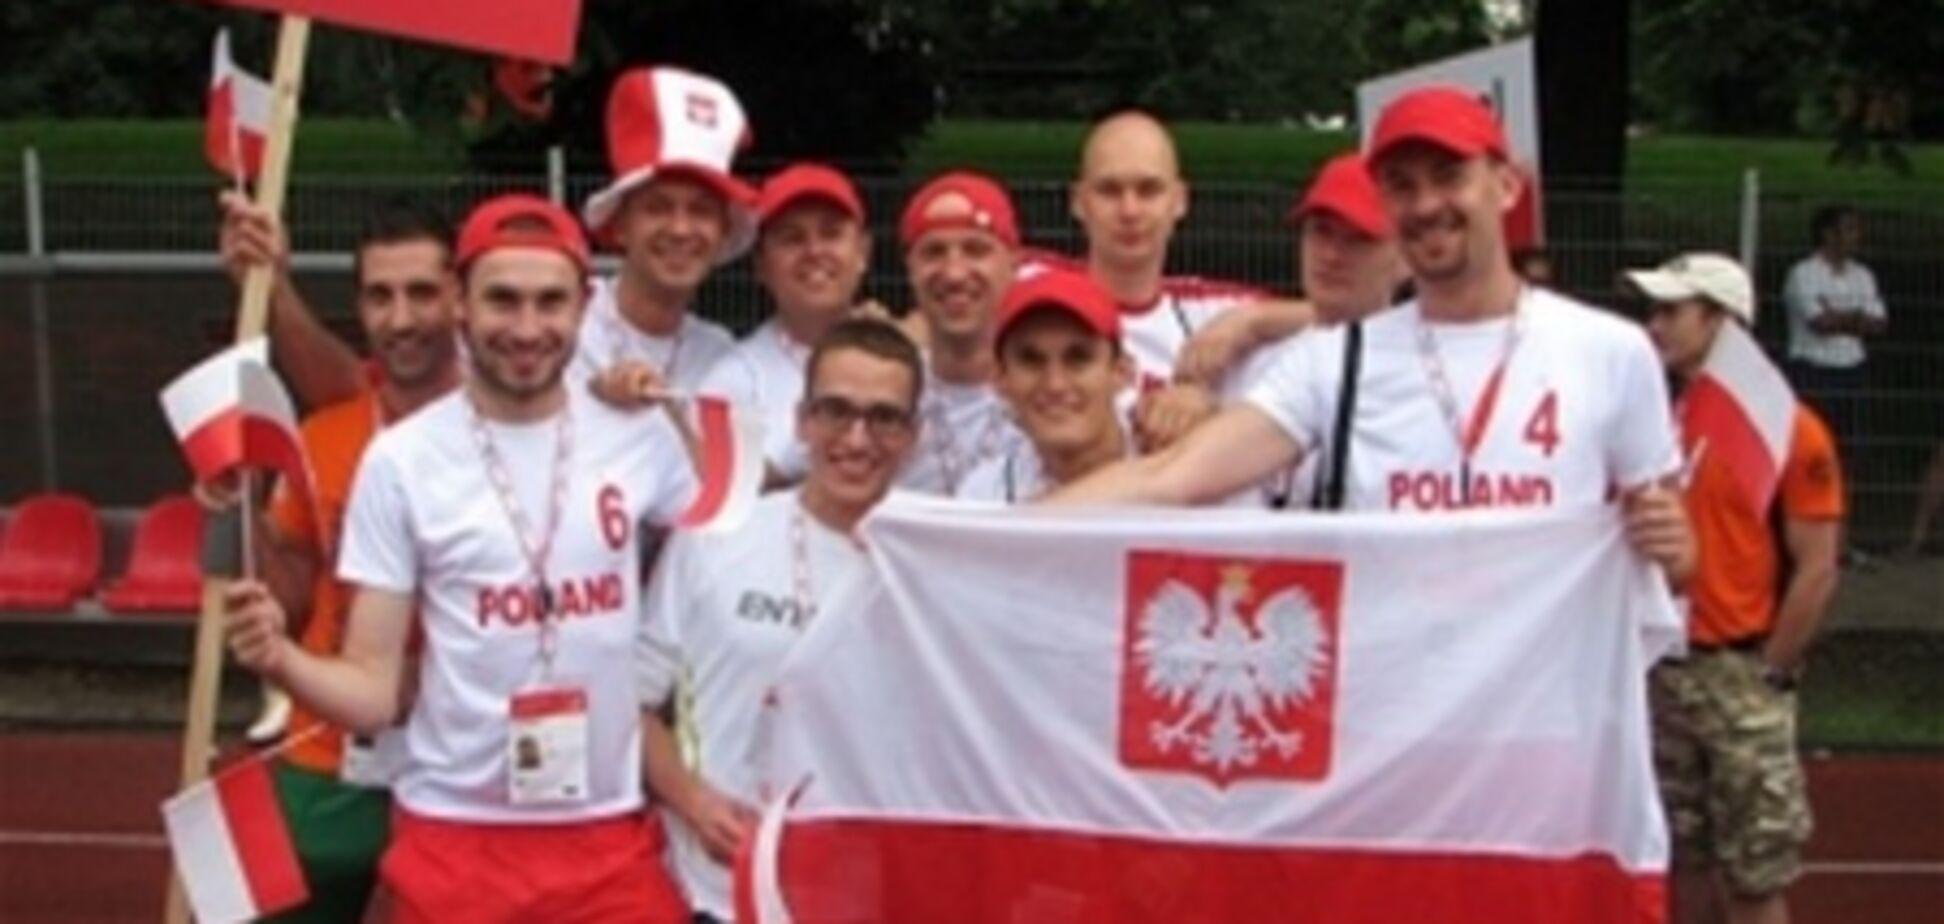 Геи-фанаты требуют независимости на Евро-2012